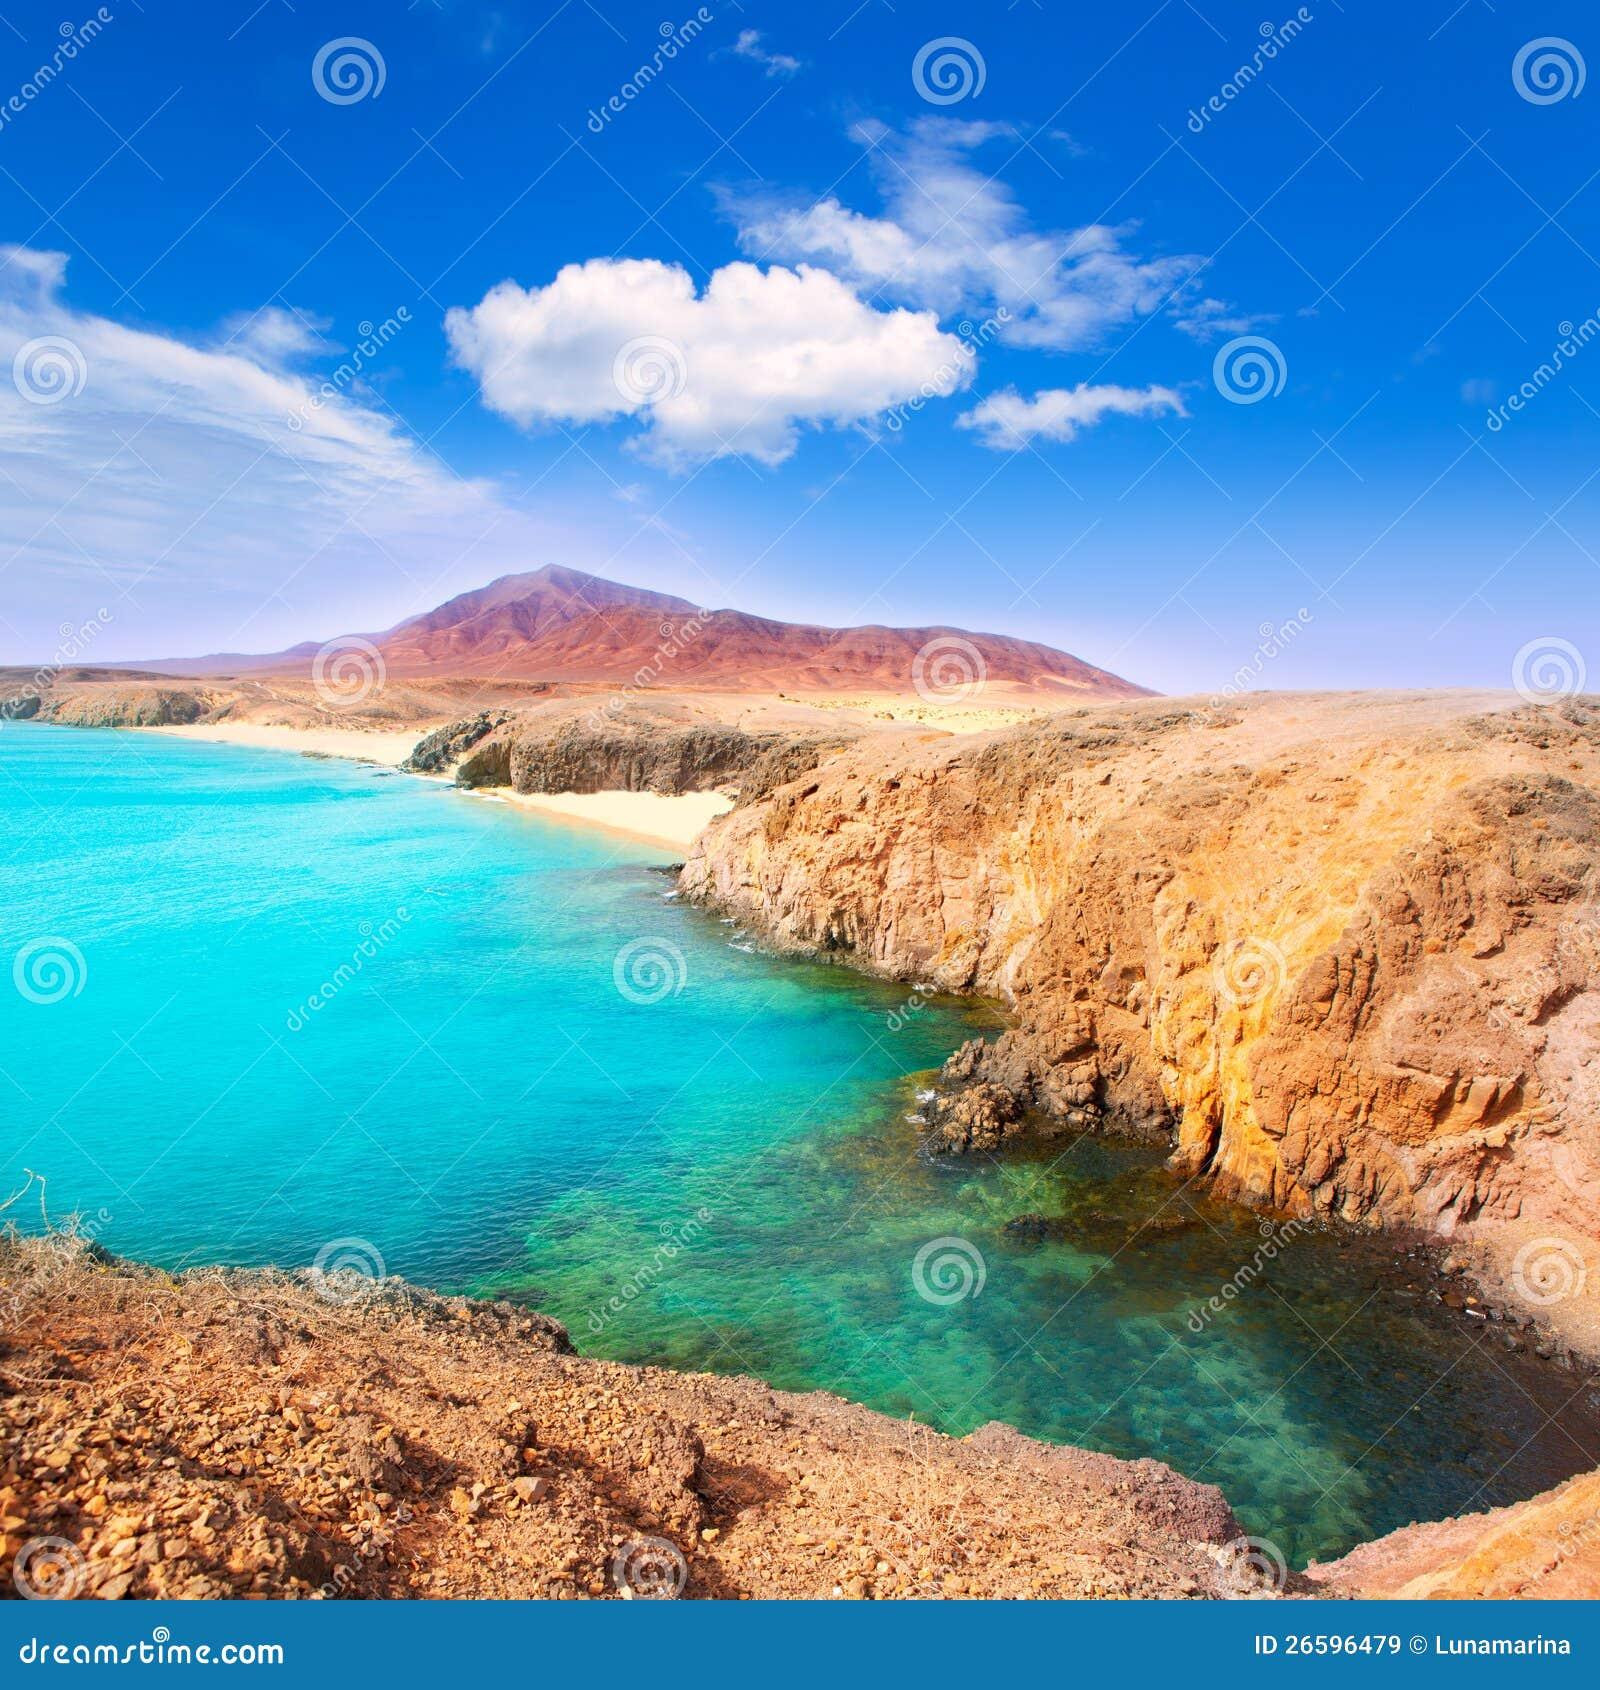 lanzarote playa del pozo beach costa papagayo royalty free stock images image 26596479. Black Bedroom Furniture Sets. Home Design Ideas